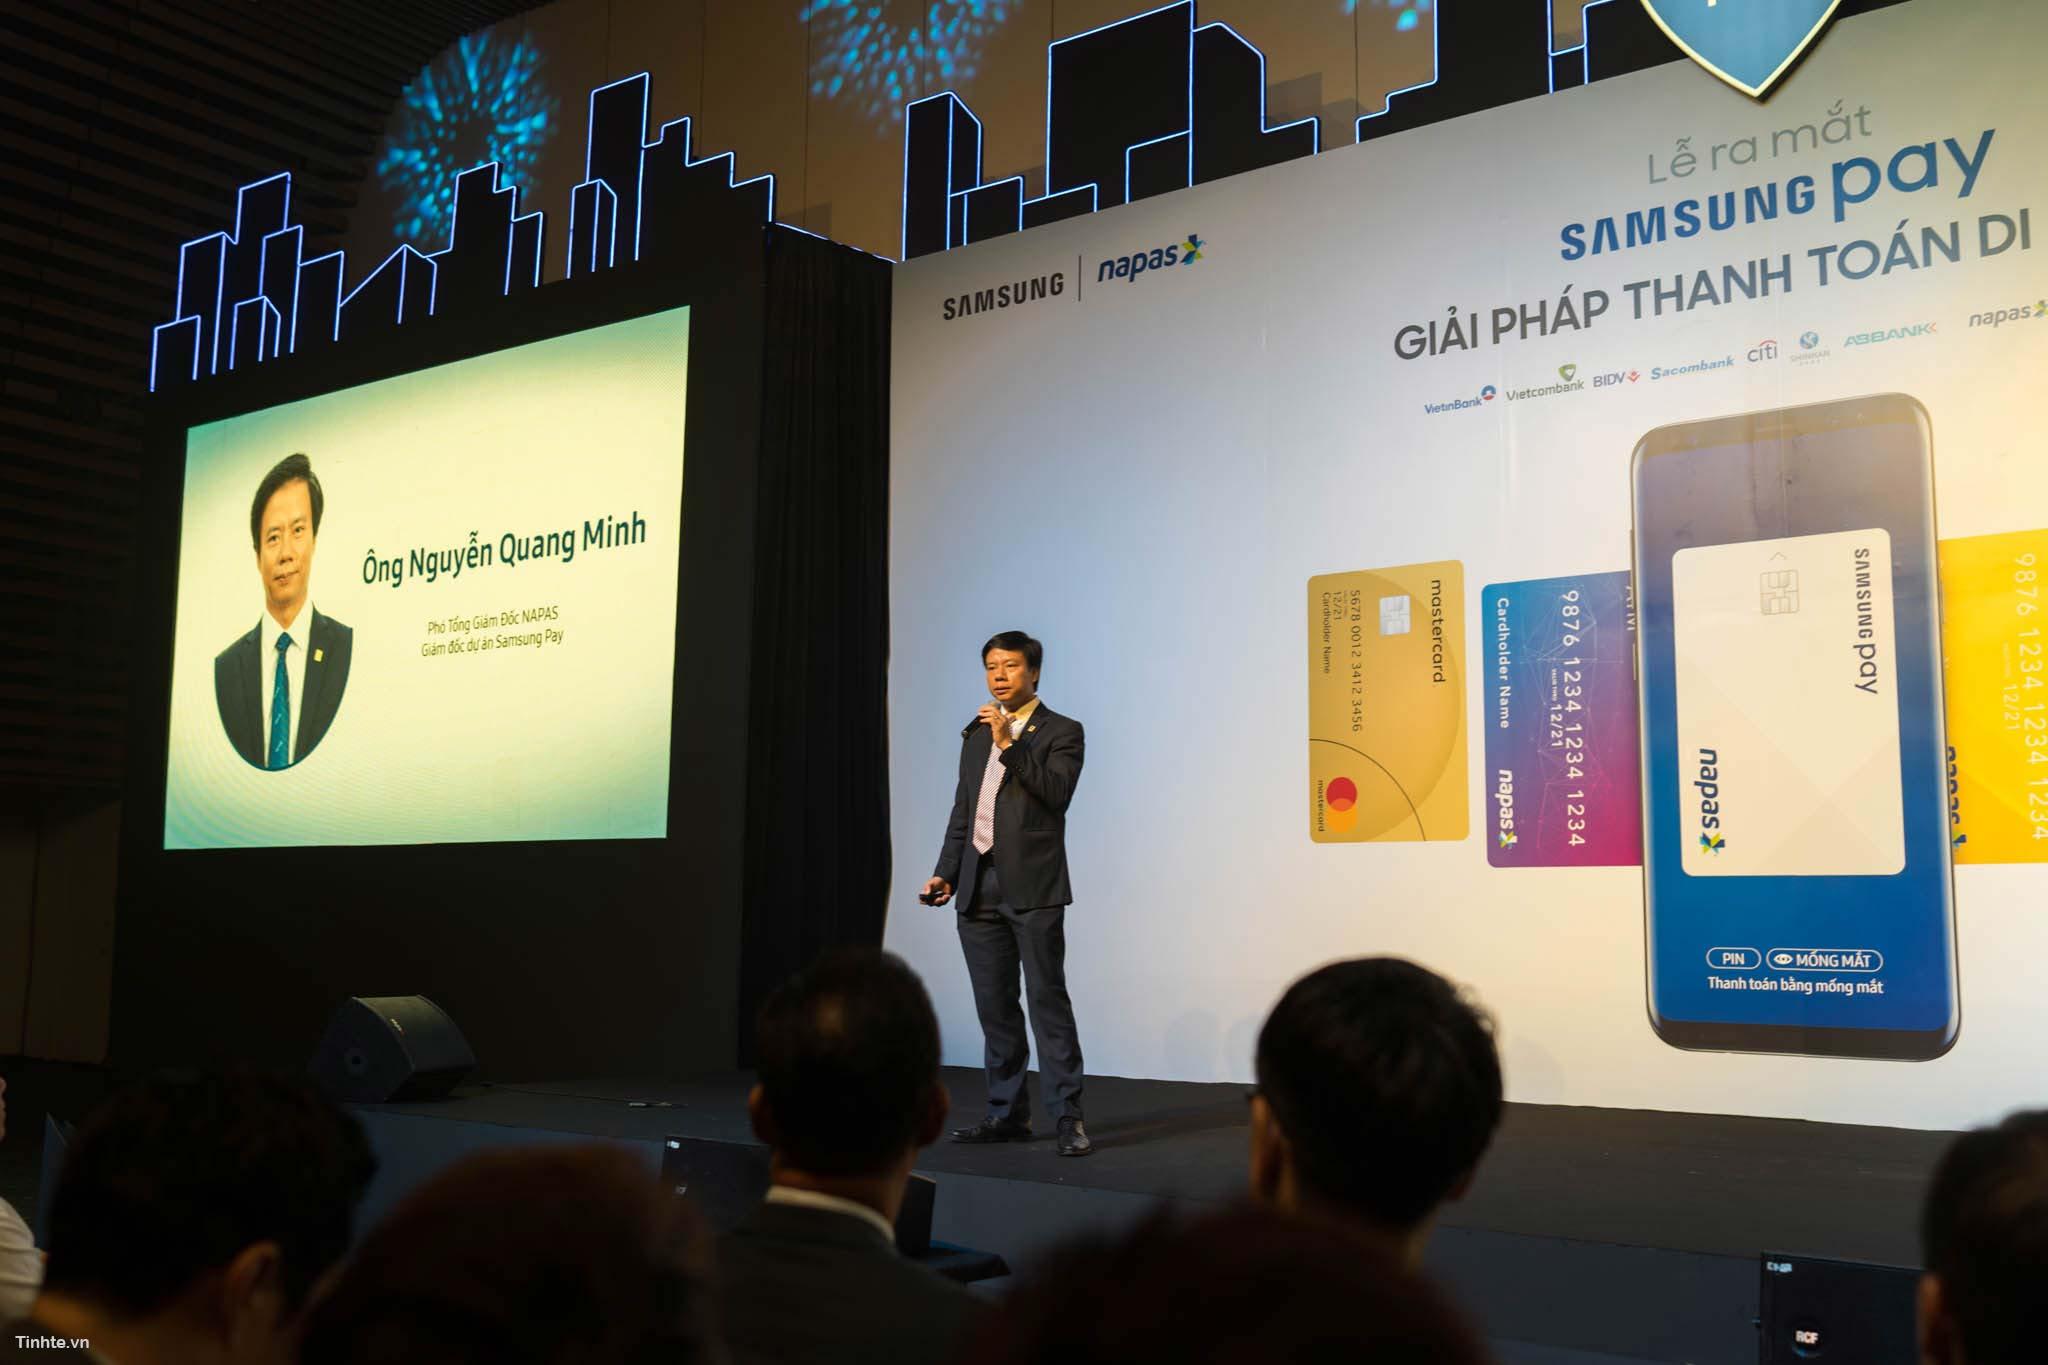 Samsung_pay-2.jpg